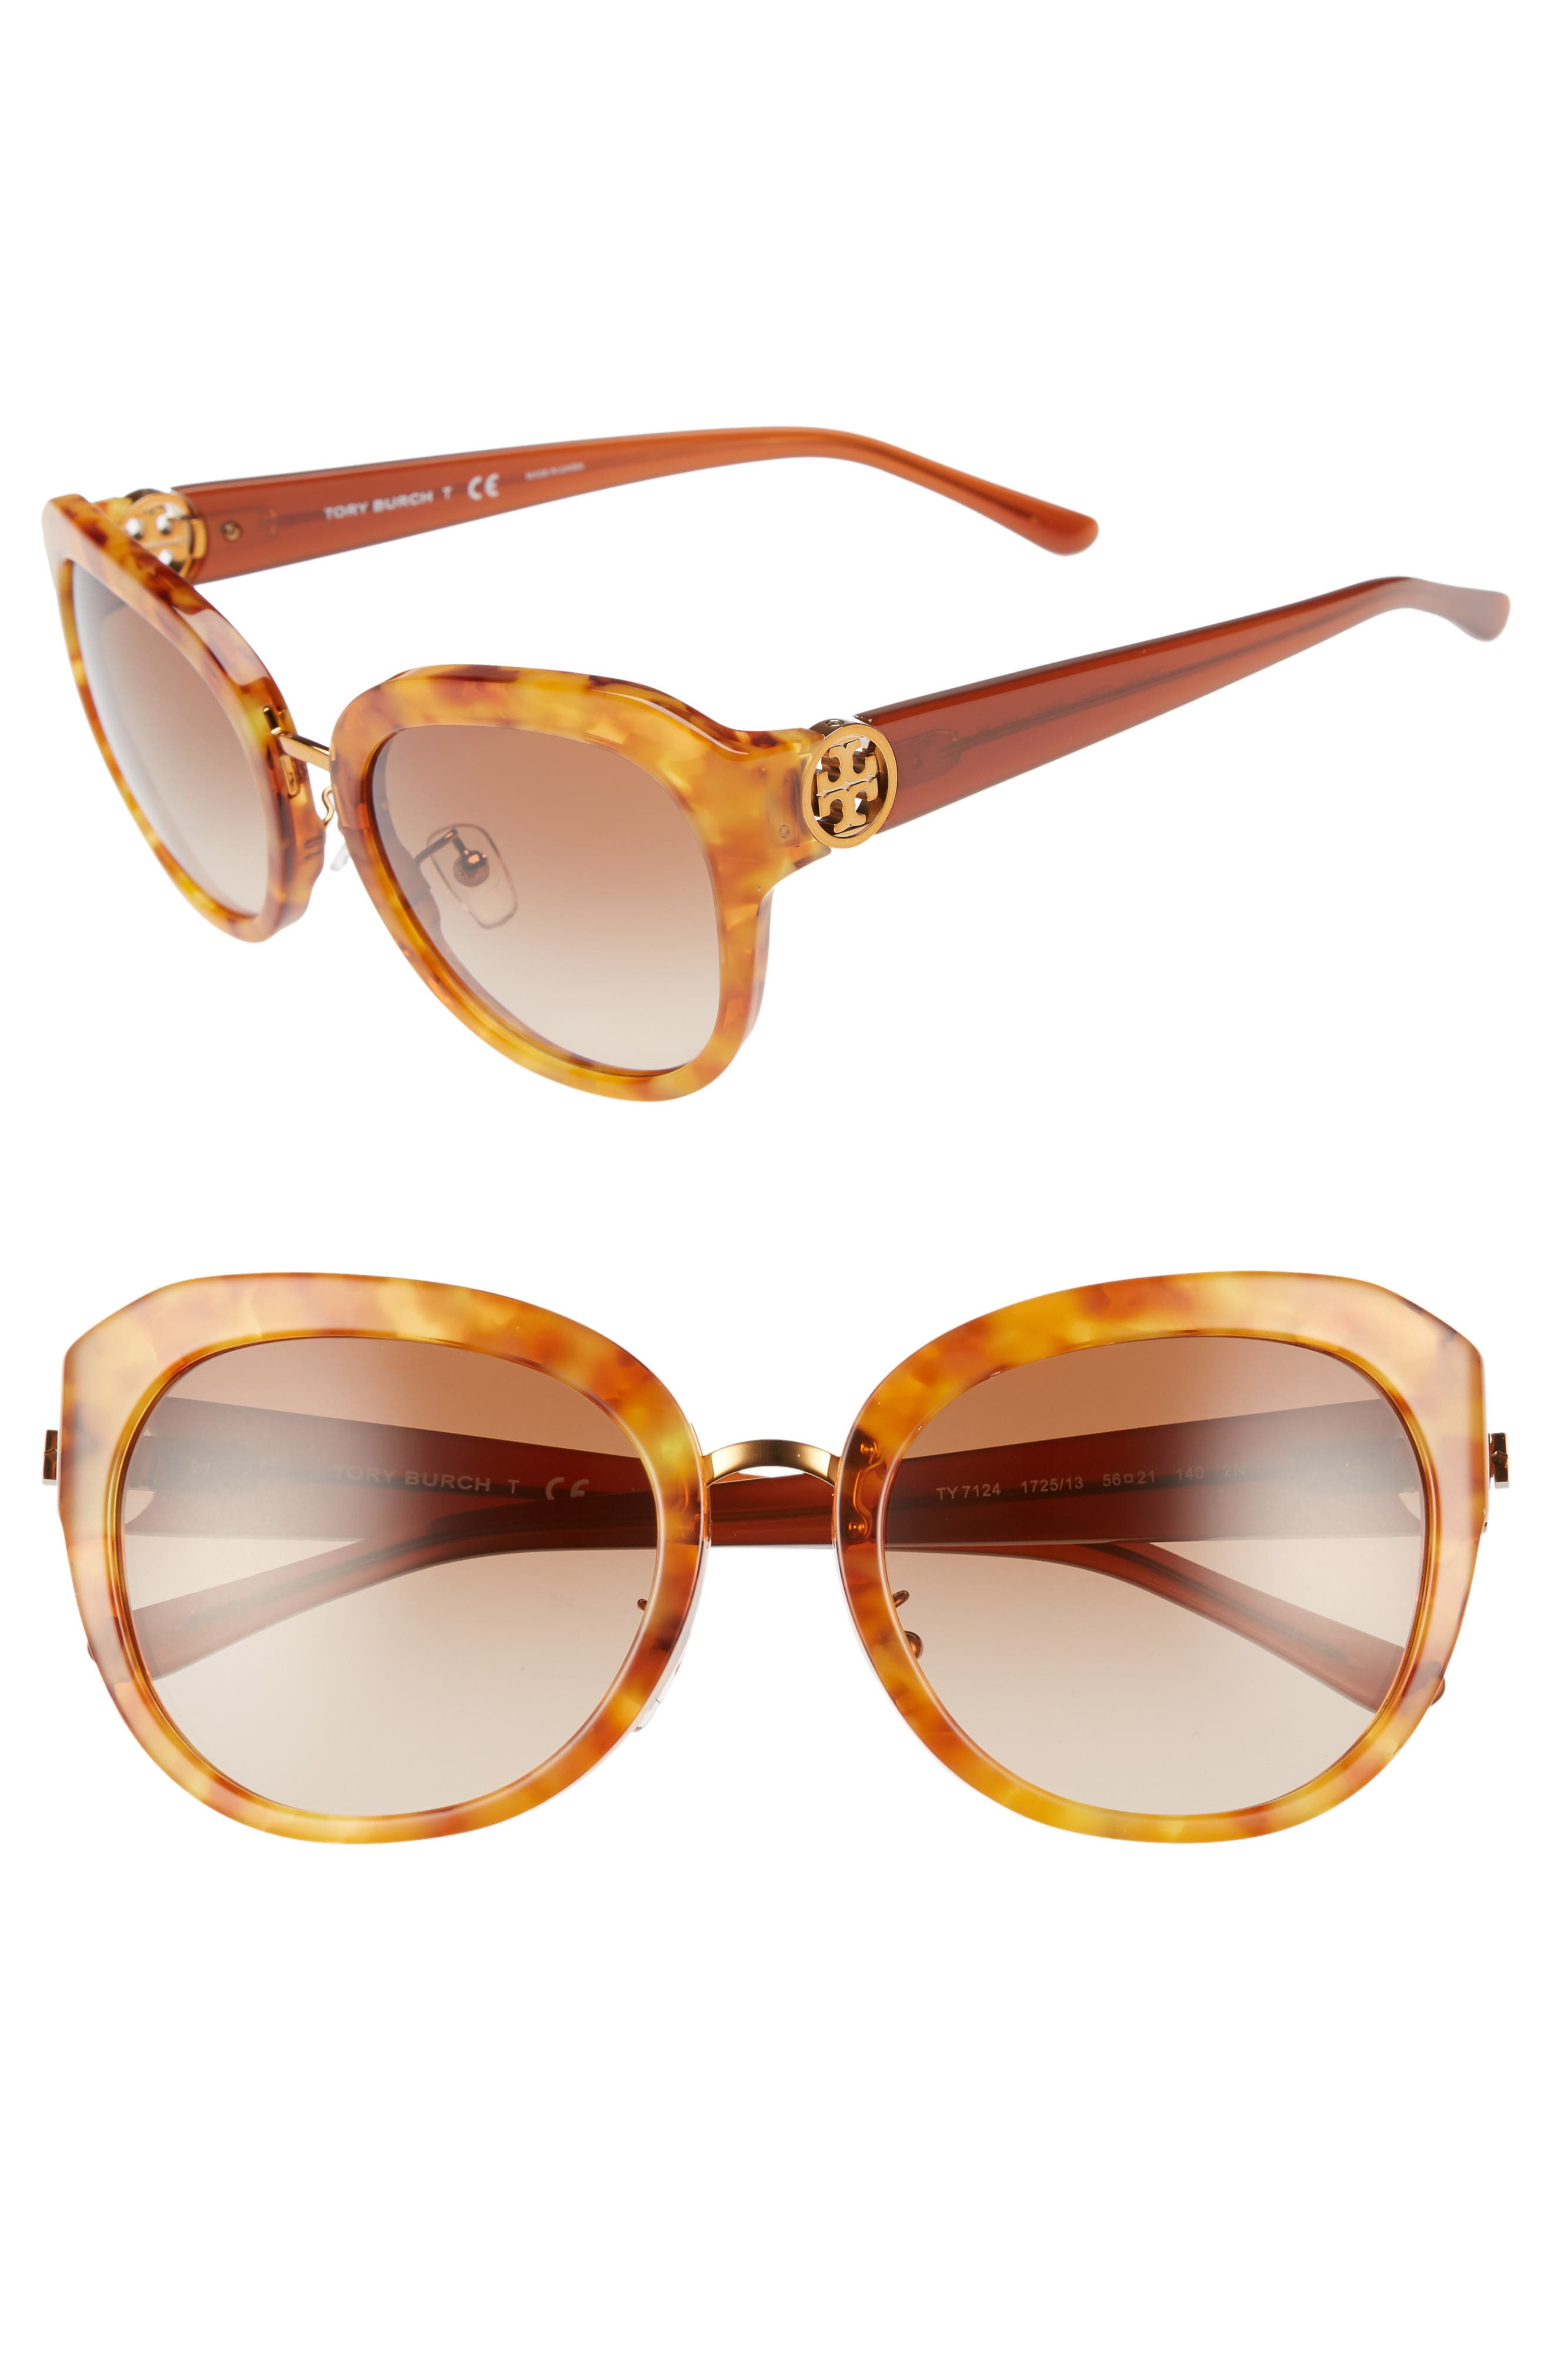 Irregular Reva 56mm Sunglasses,                             Main thumbnail 1, color,                             AMBER GRADIENT